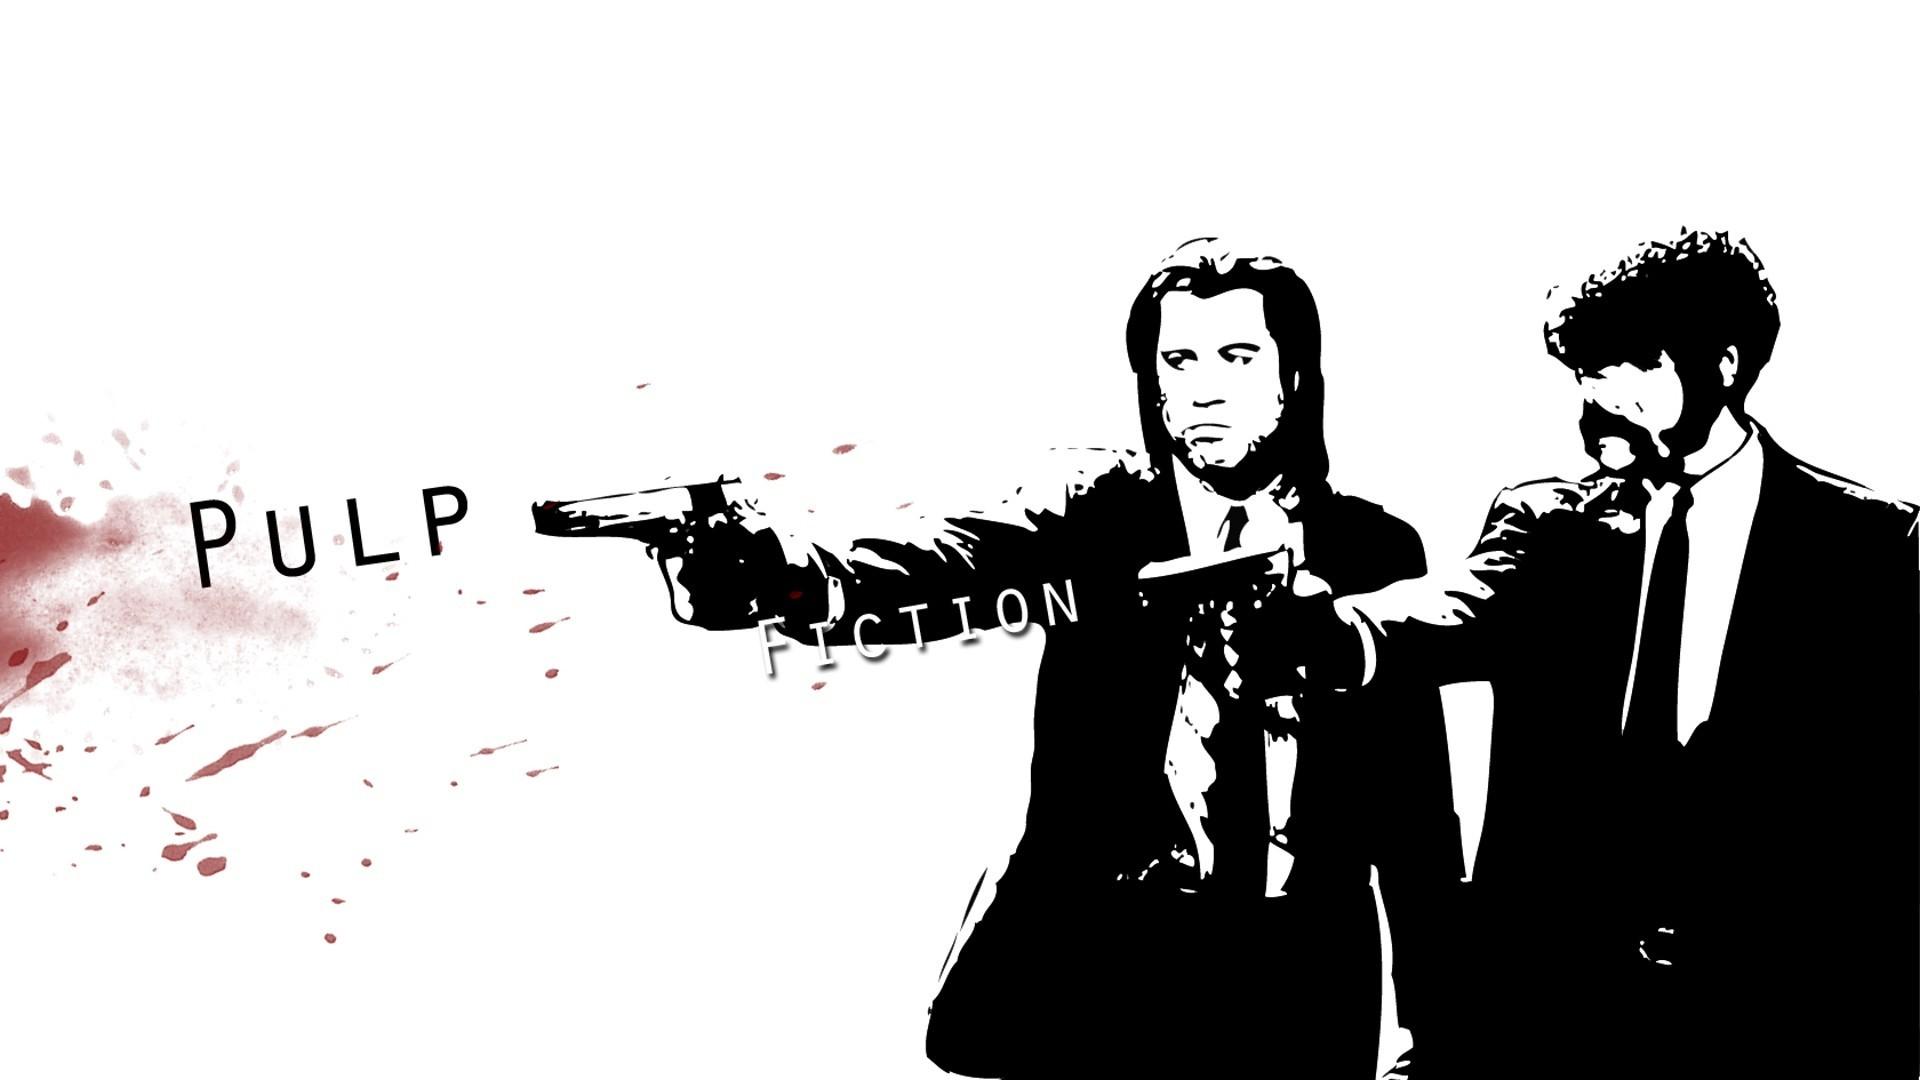 movies, Pulp Fiction, Samuel L. Jackson, John Travolta Wallpapers HD /  Desktop and Mobile Backgrounds